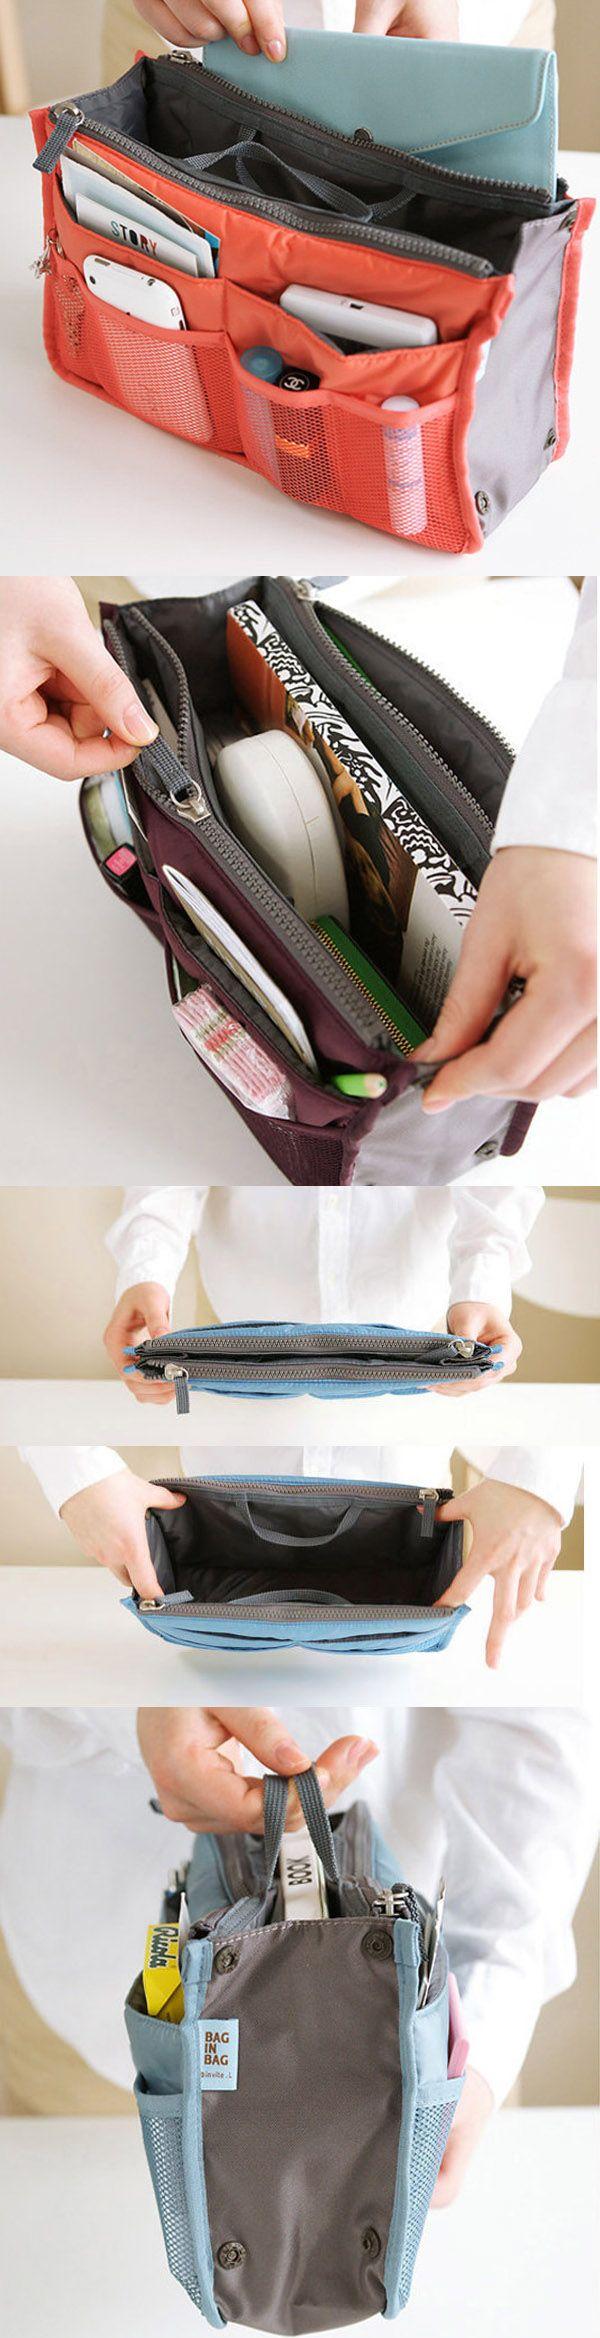 [ONLY US$5] Women Travel Insert Handbag,Nylon Large Liner Organizer Tidy Bag,Cosmetic Bag